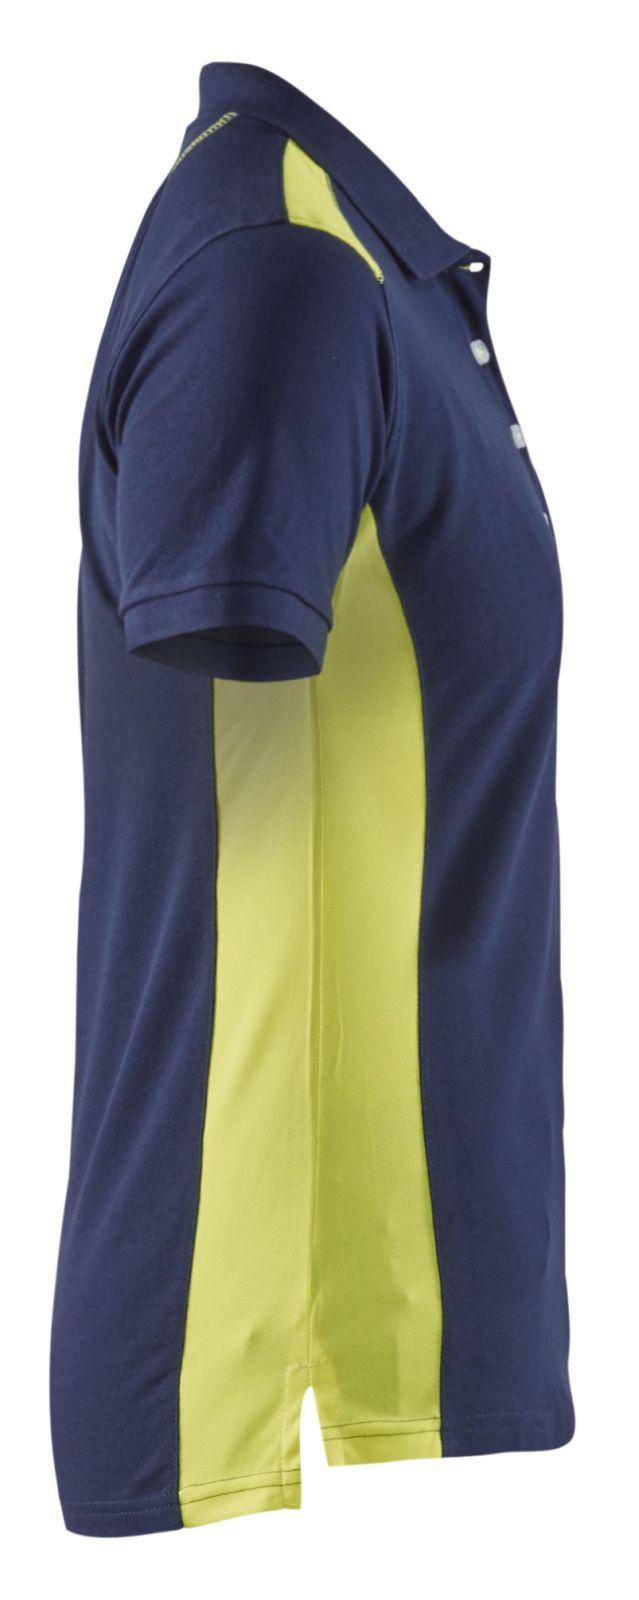 Blaklader Dames polo shirts 33901050 marineblauw-geel(8933)